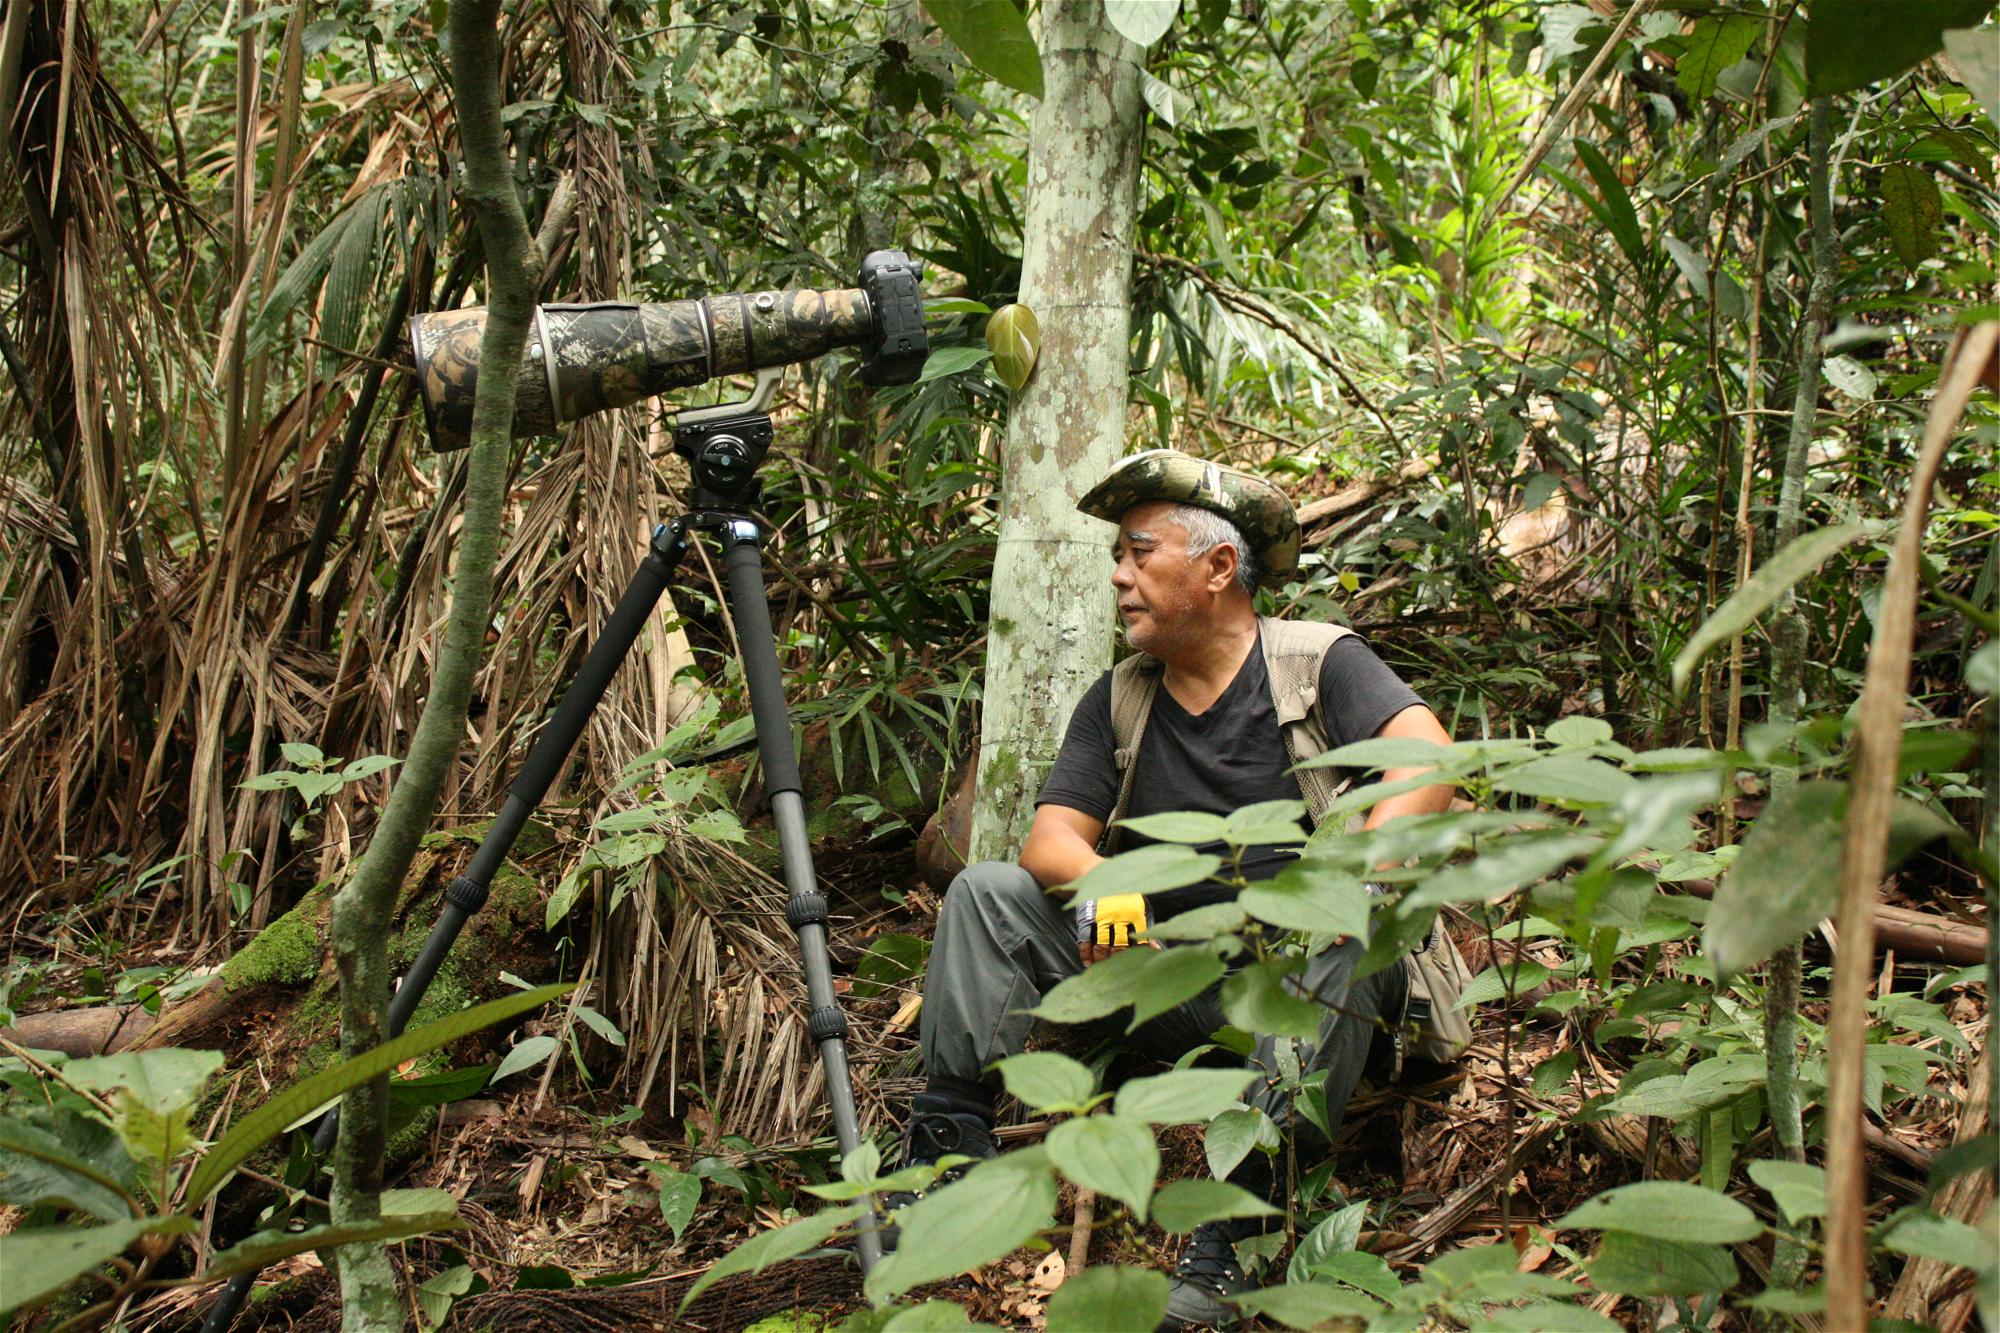 Zhuang Qiang, 55, waits for the cock-of-the-rock (image: Andrés Bermúdez Liévano)